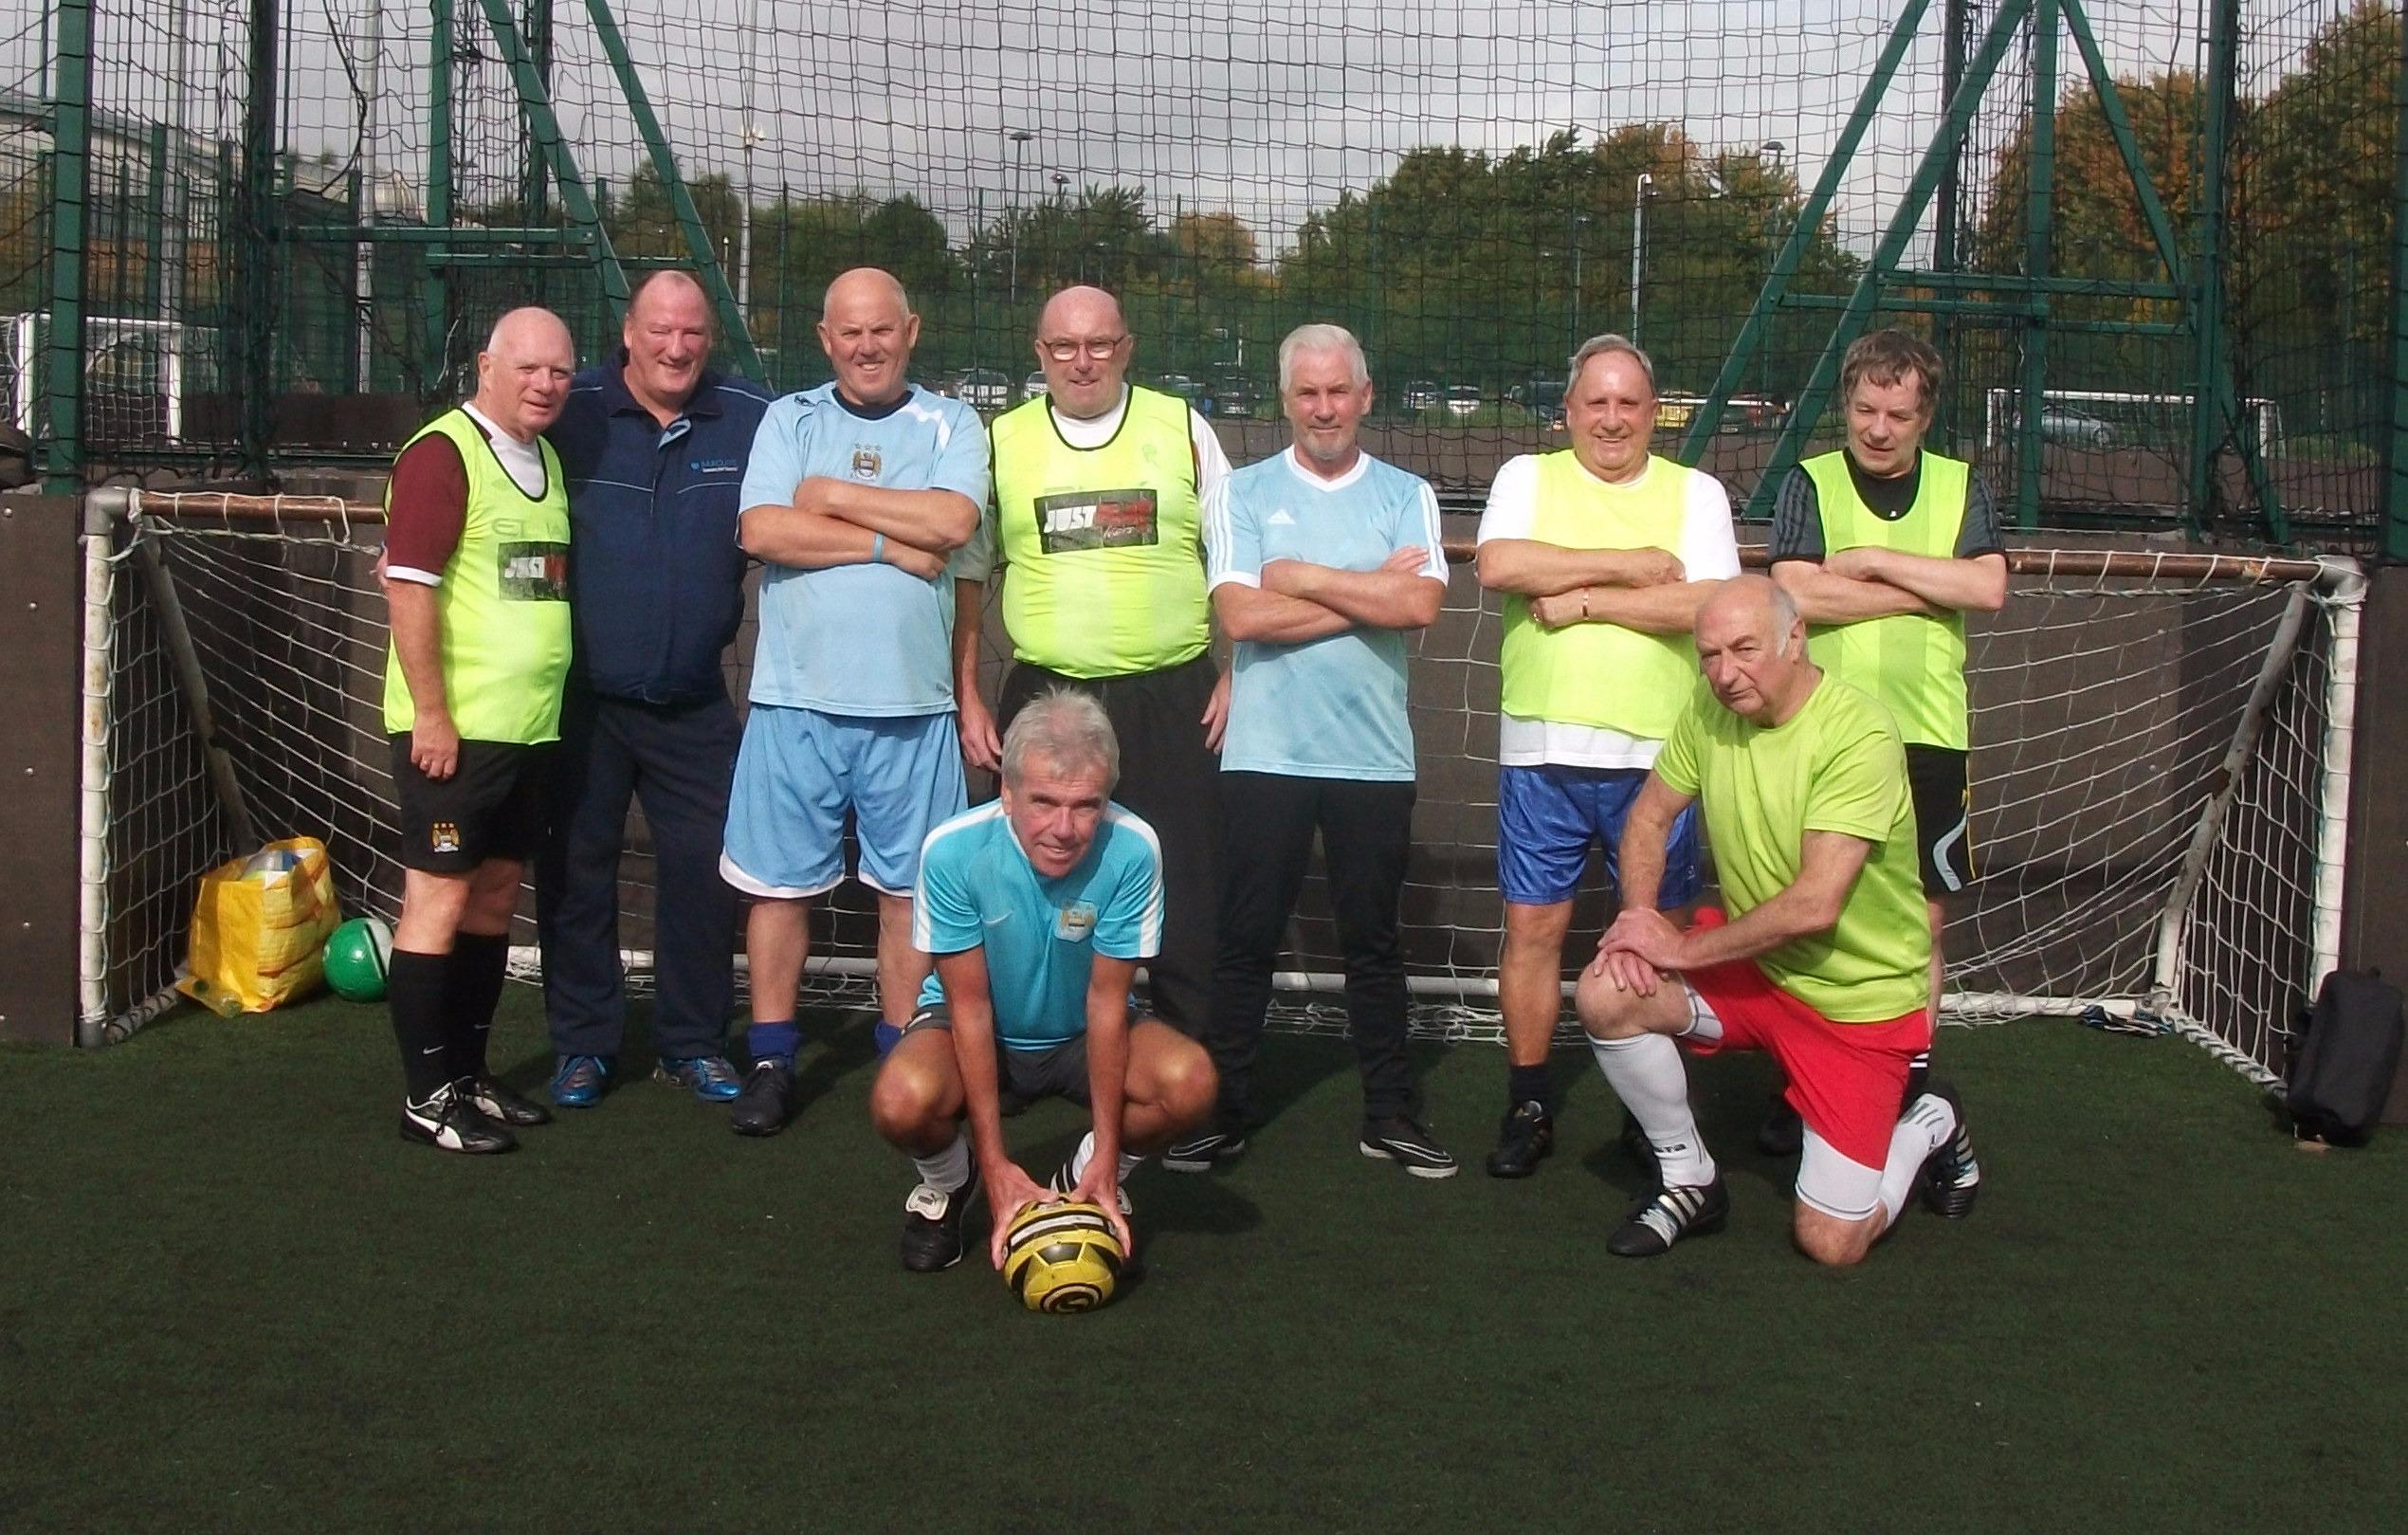 Over 50s Walking Football